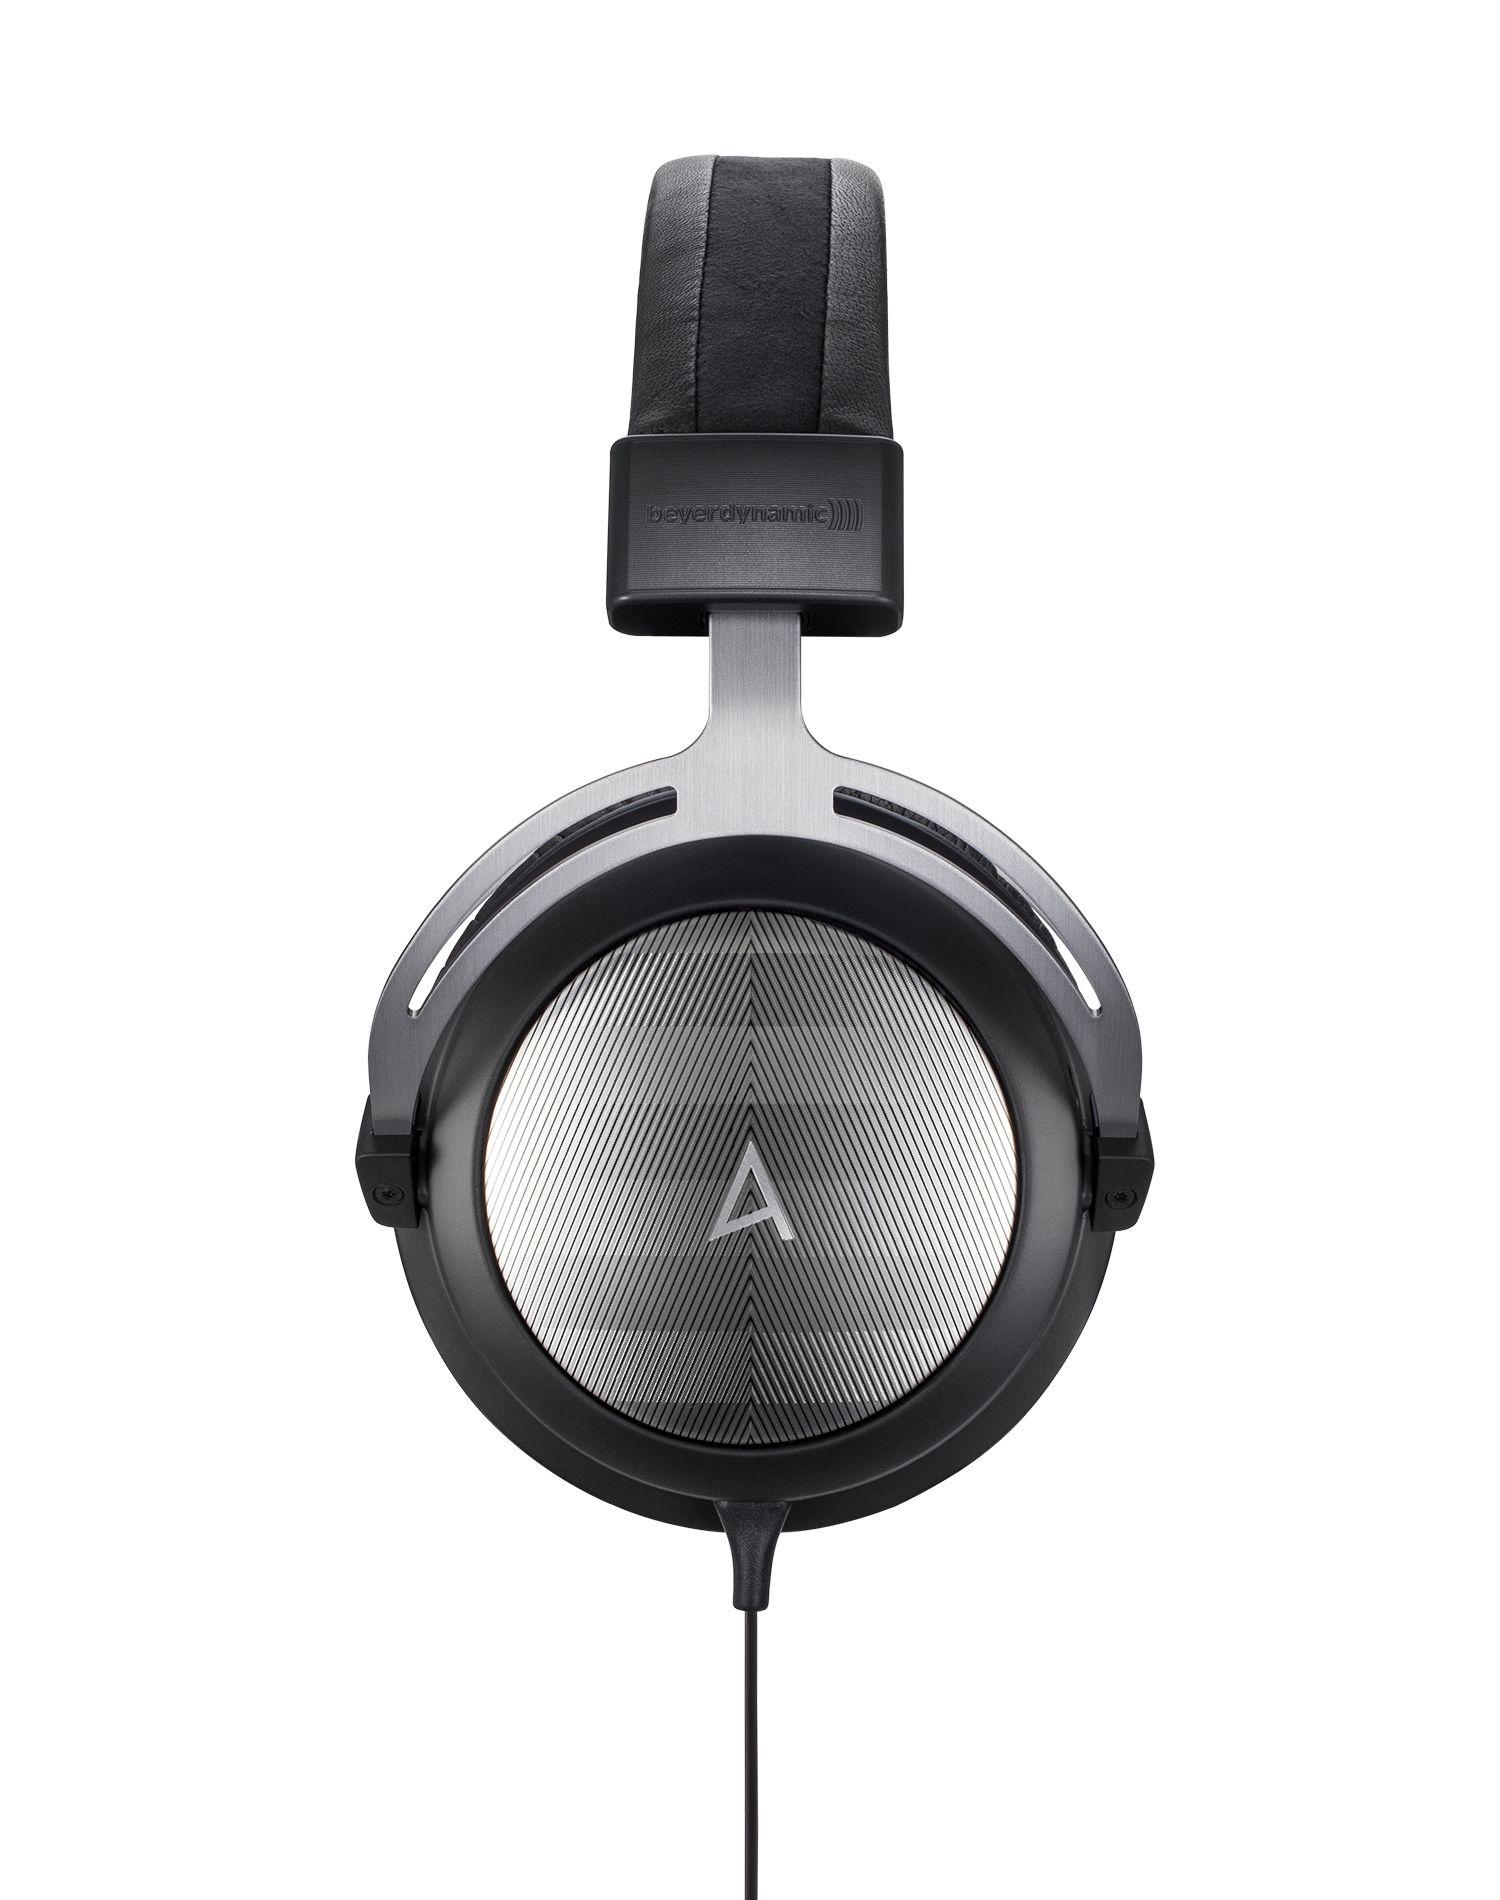 Astell & Kern AKT5p Headphones Canada Headphones, Jbl